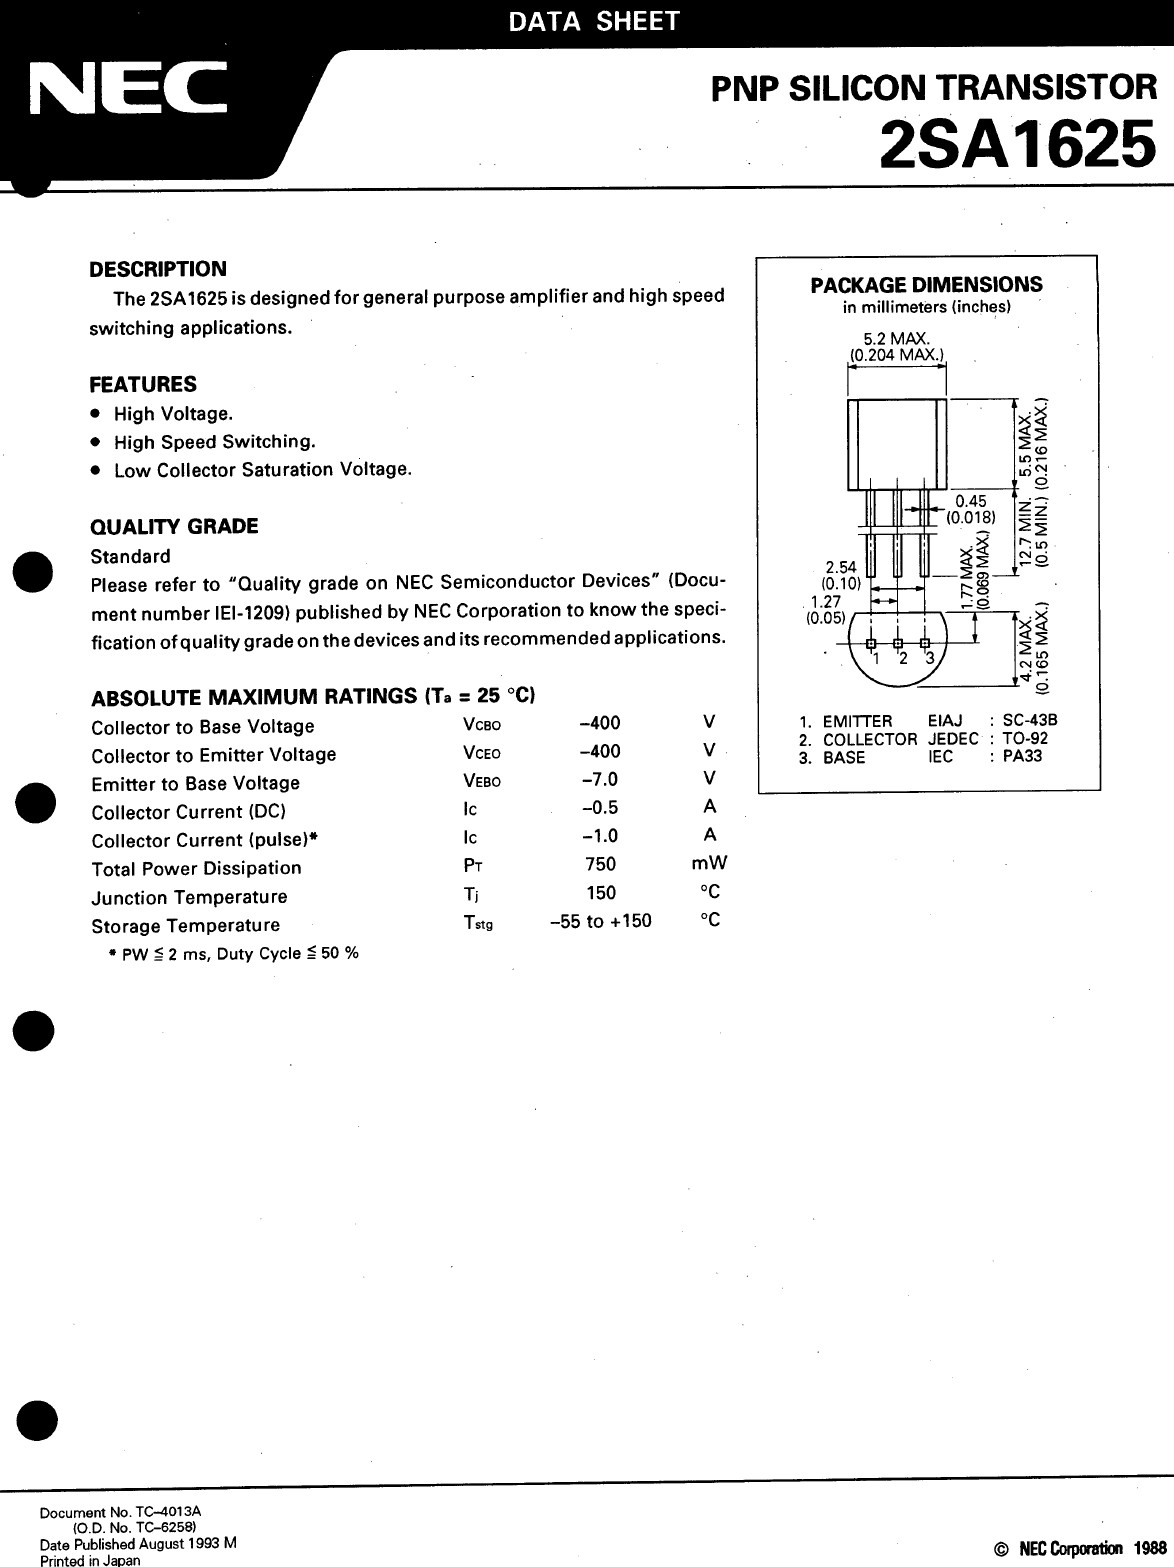 Tranzisztor PNP 400V 0.5A 0.75W <1/6uS 2SA1625 2SA1625 -